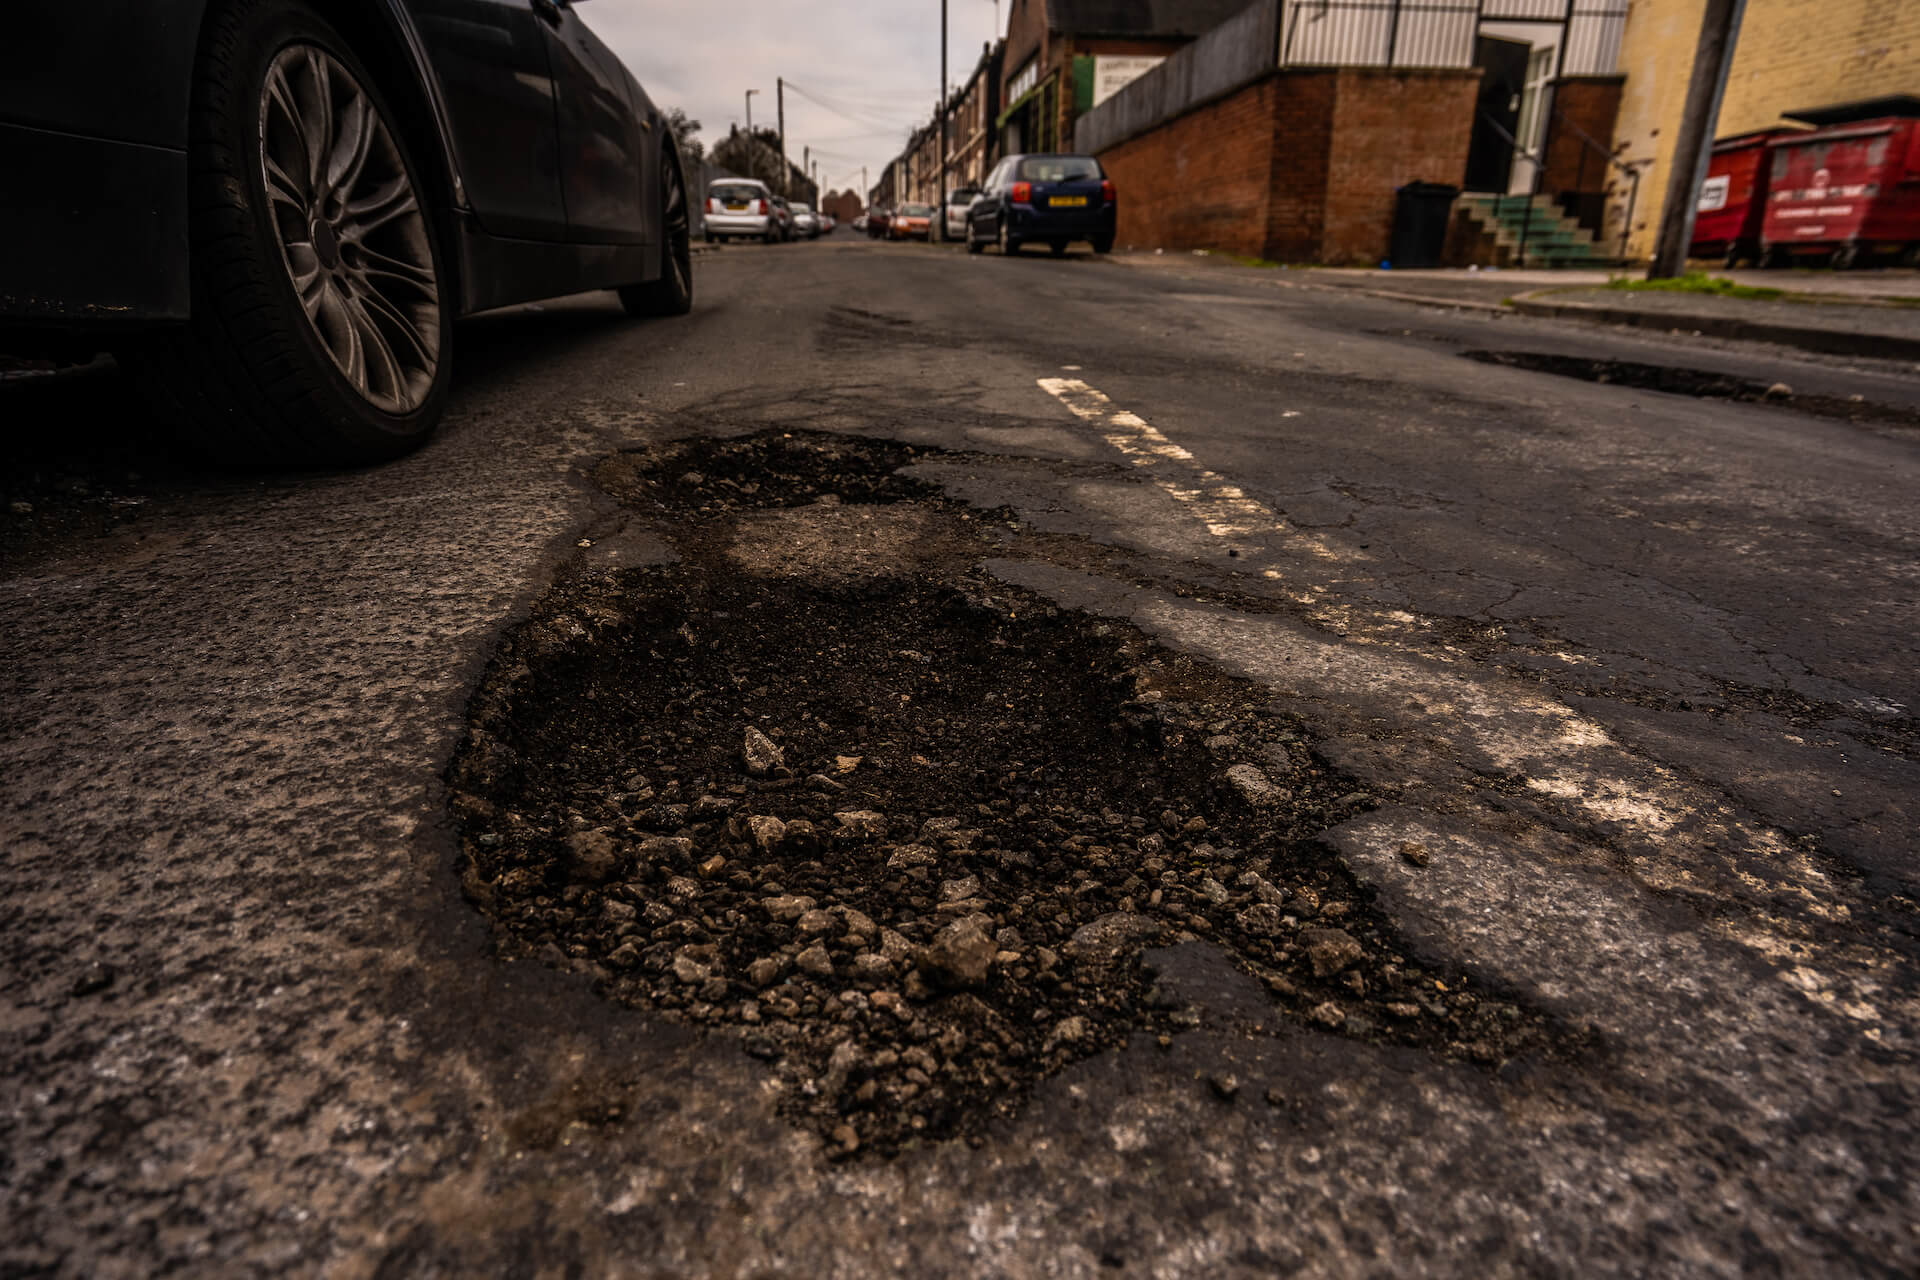 Beware of potholes